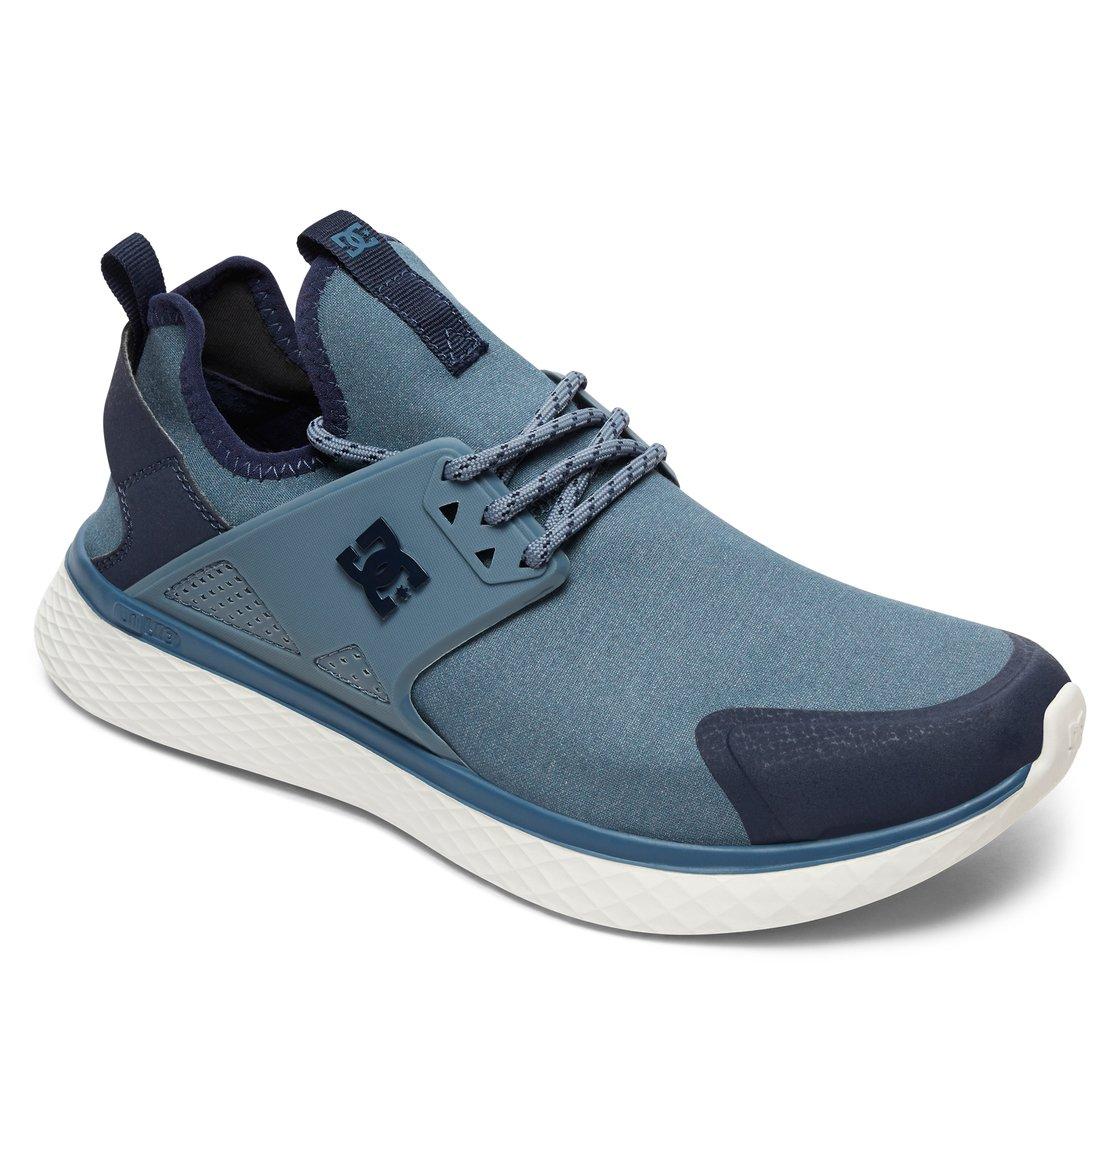 Männer Schuhe Meridian Prestige Meridian Für lF1TKJc